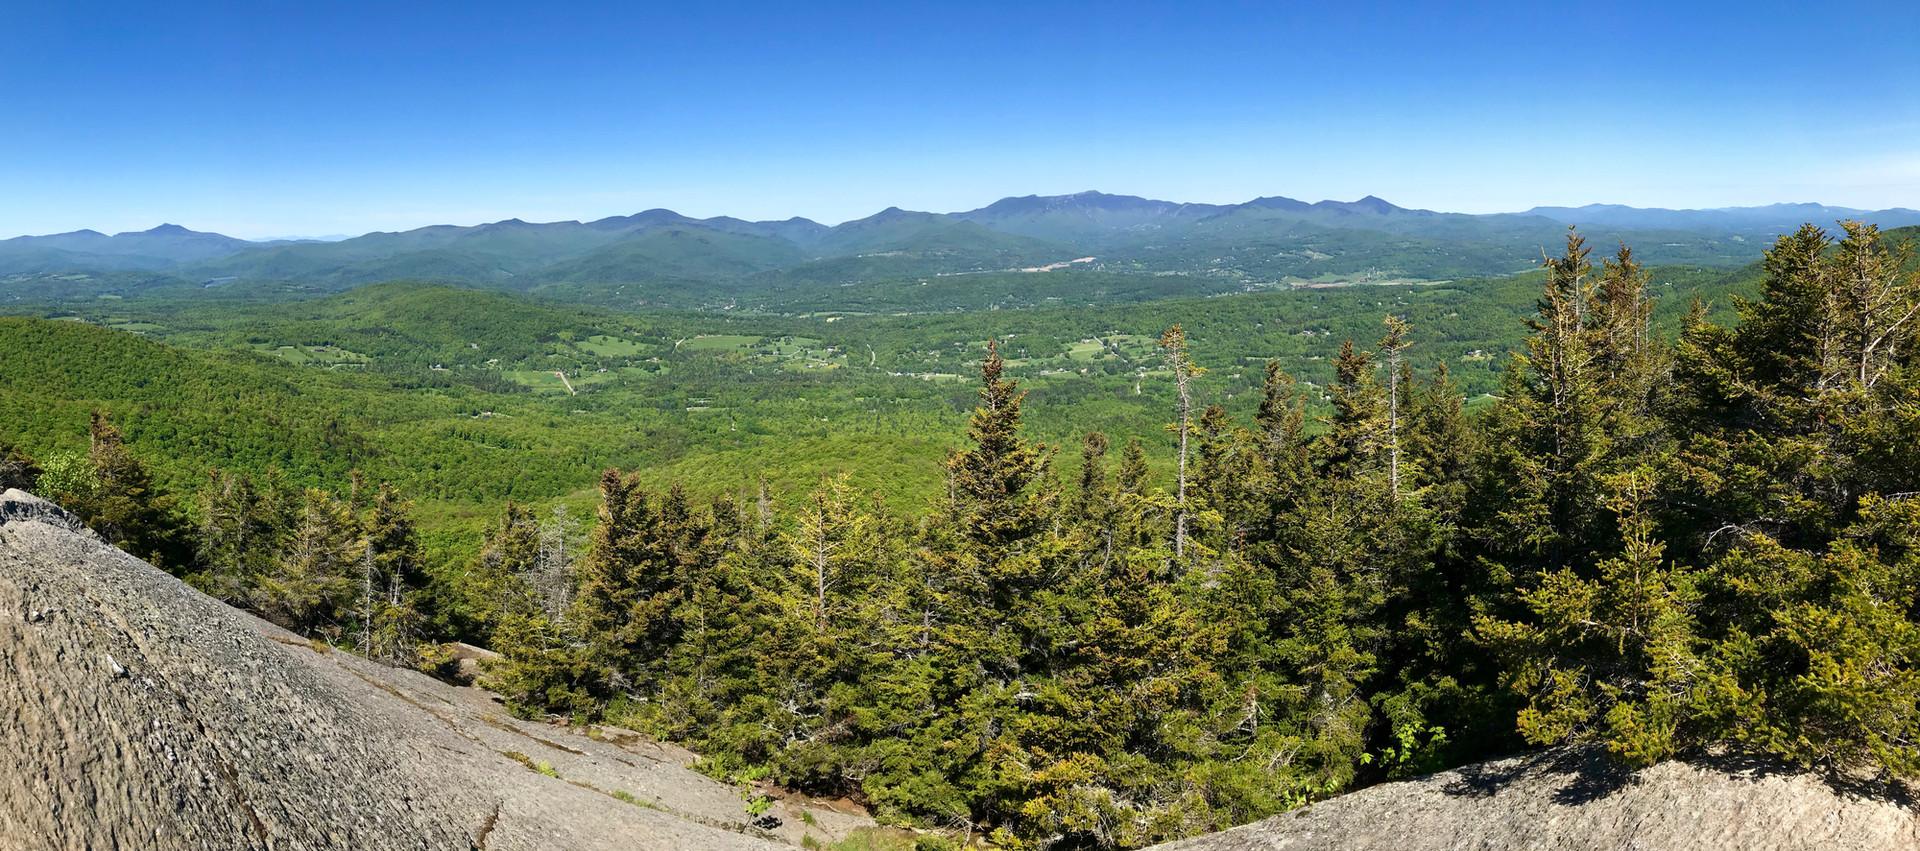 Giant Mountain, Adirondack Park, NY